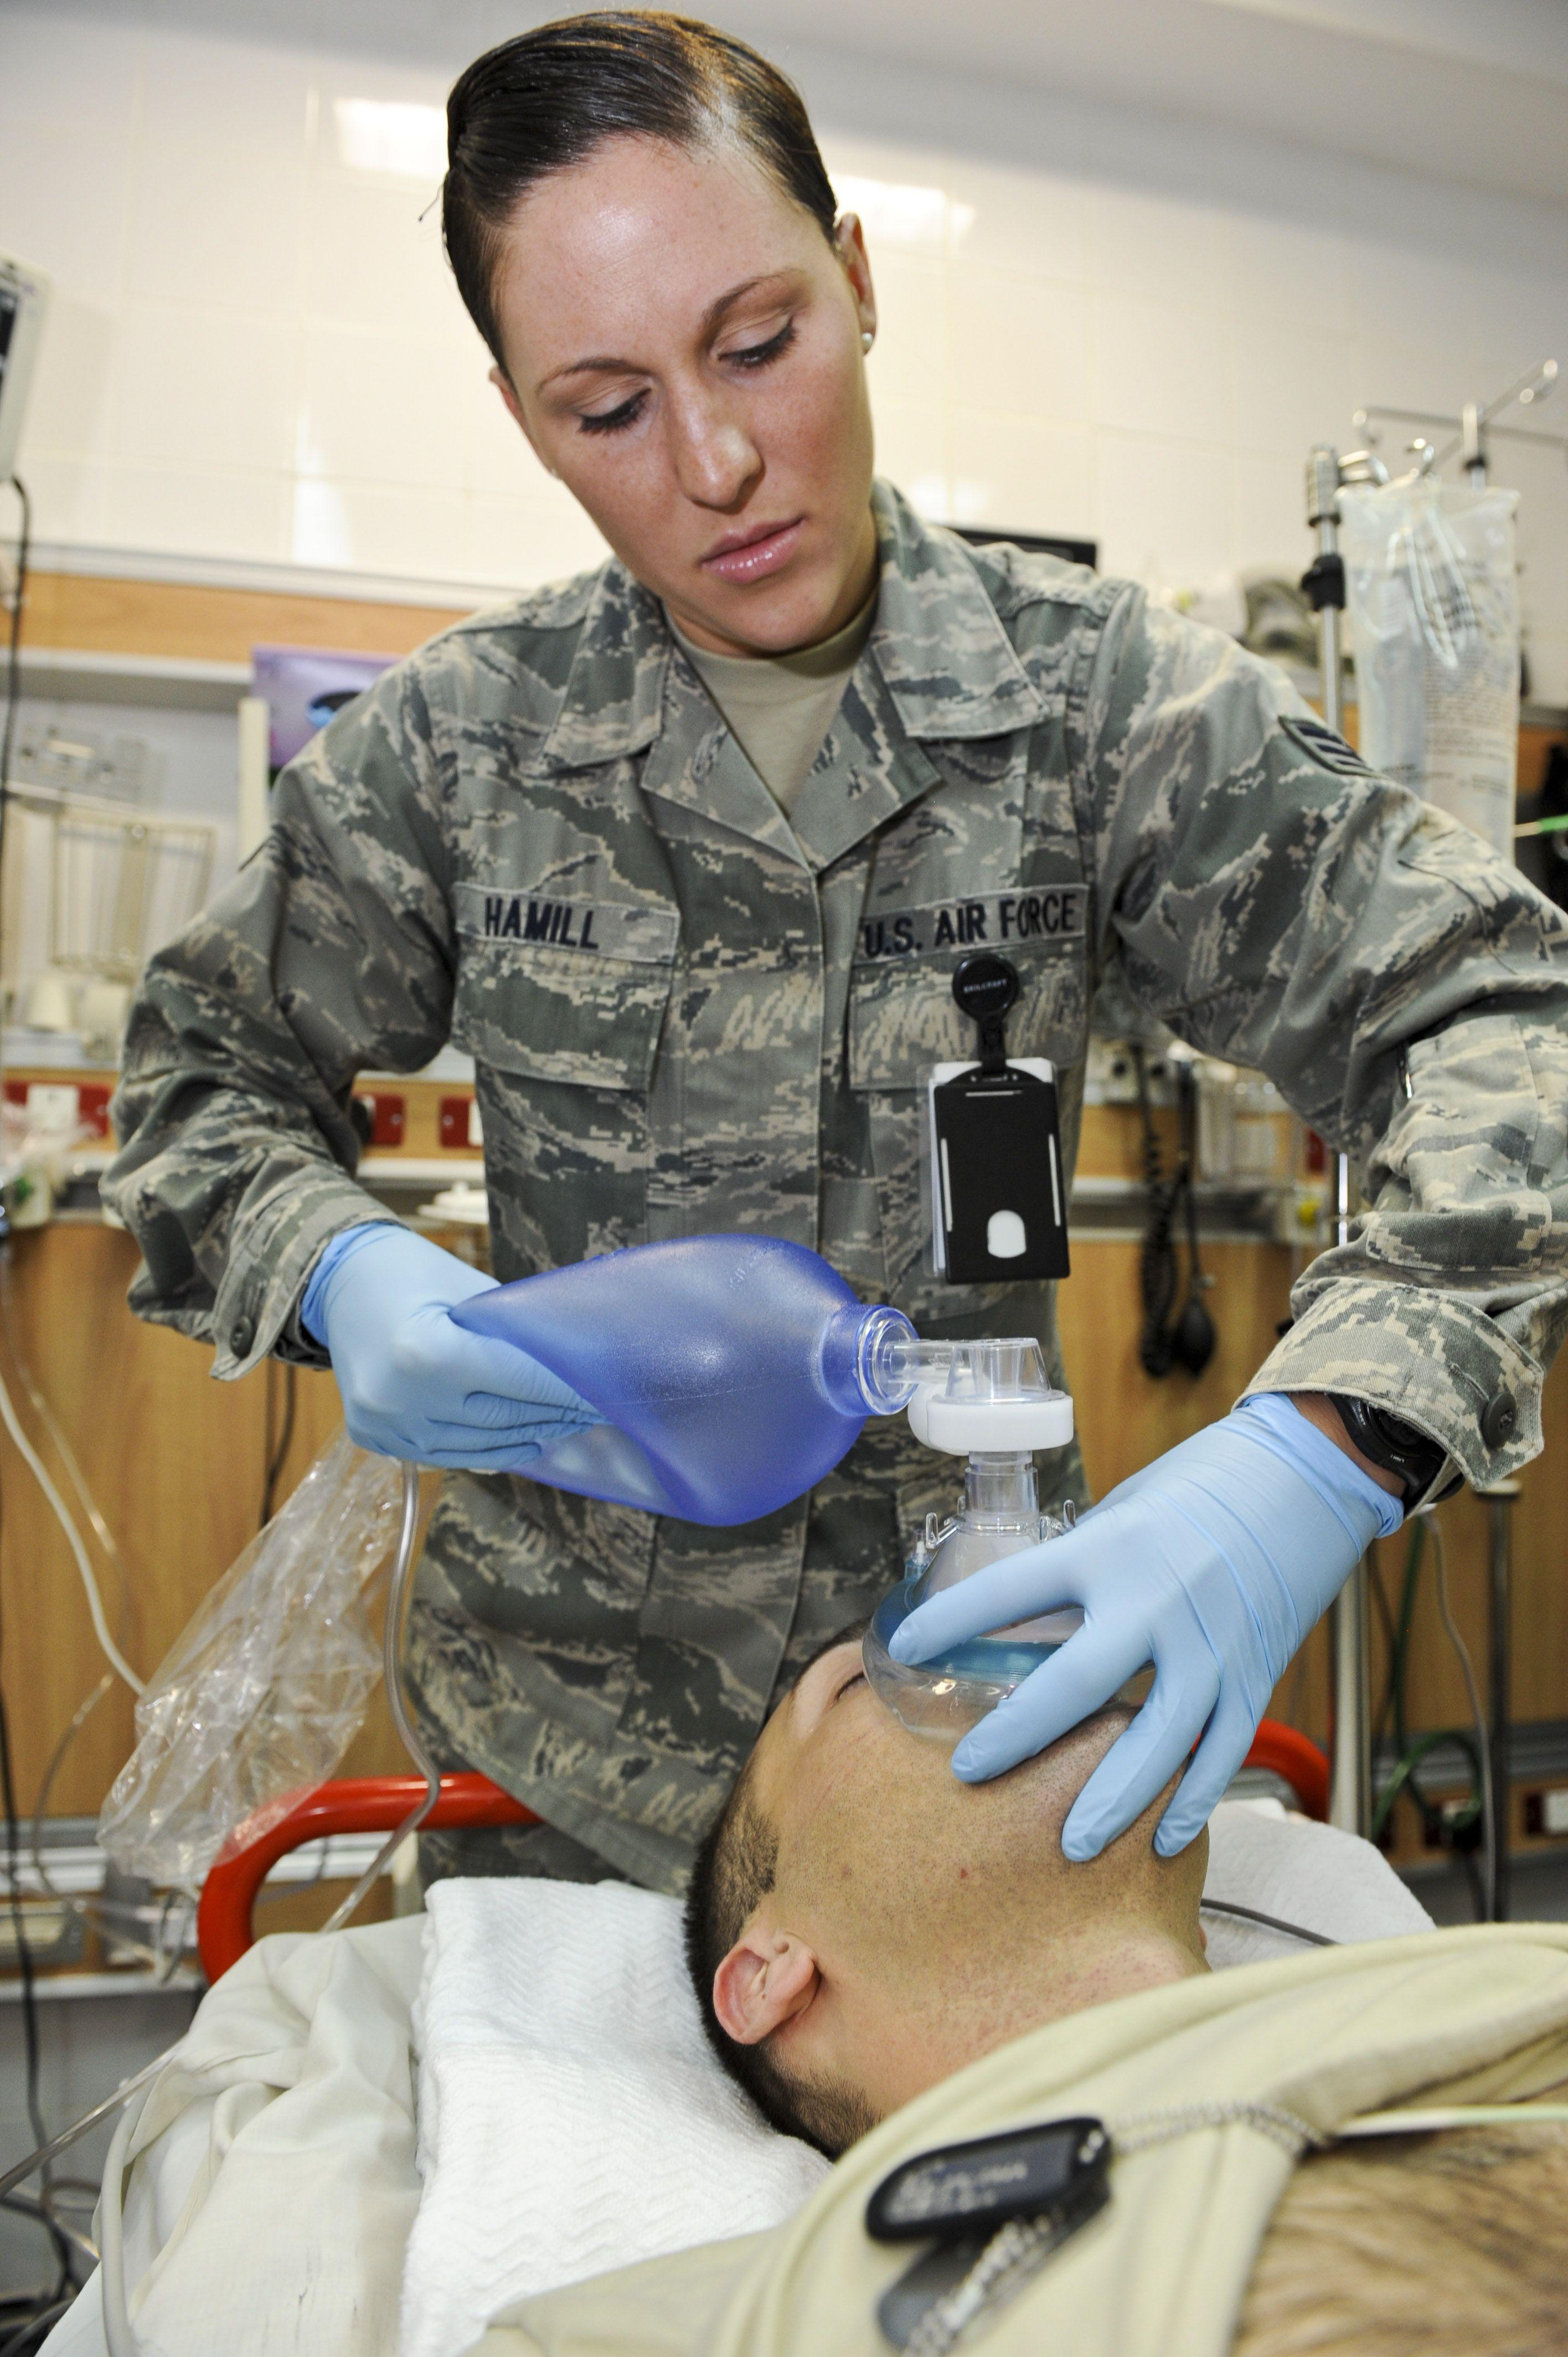 Day on the Job Nurse, medical technician > U.S. Air